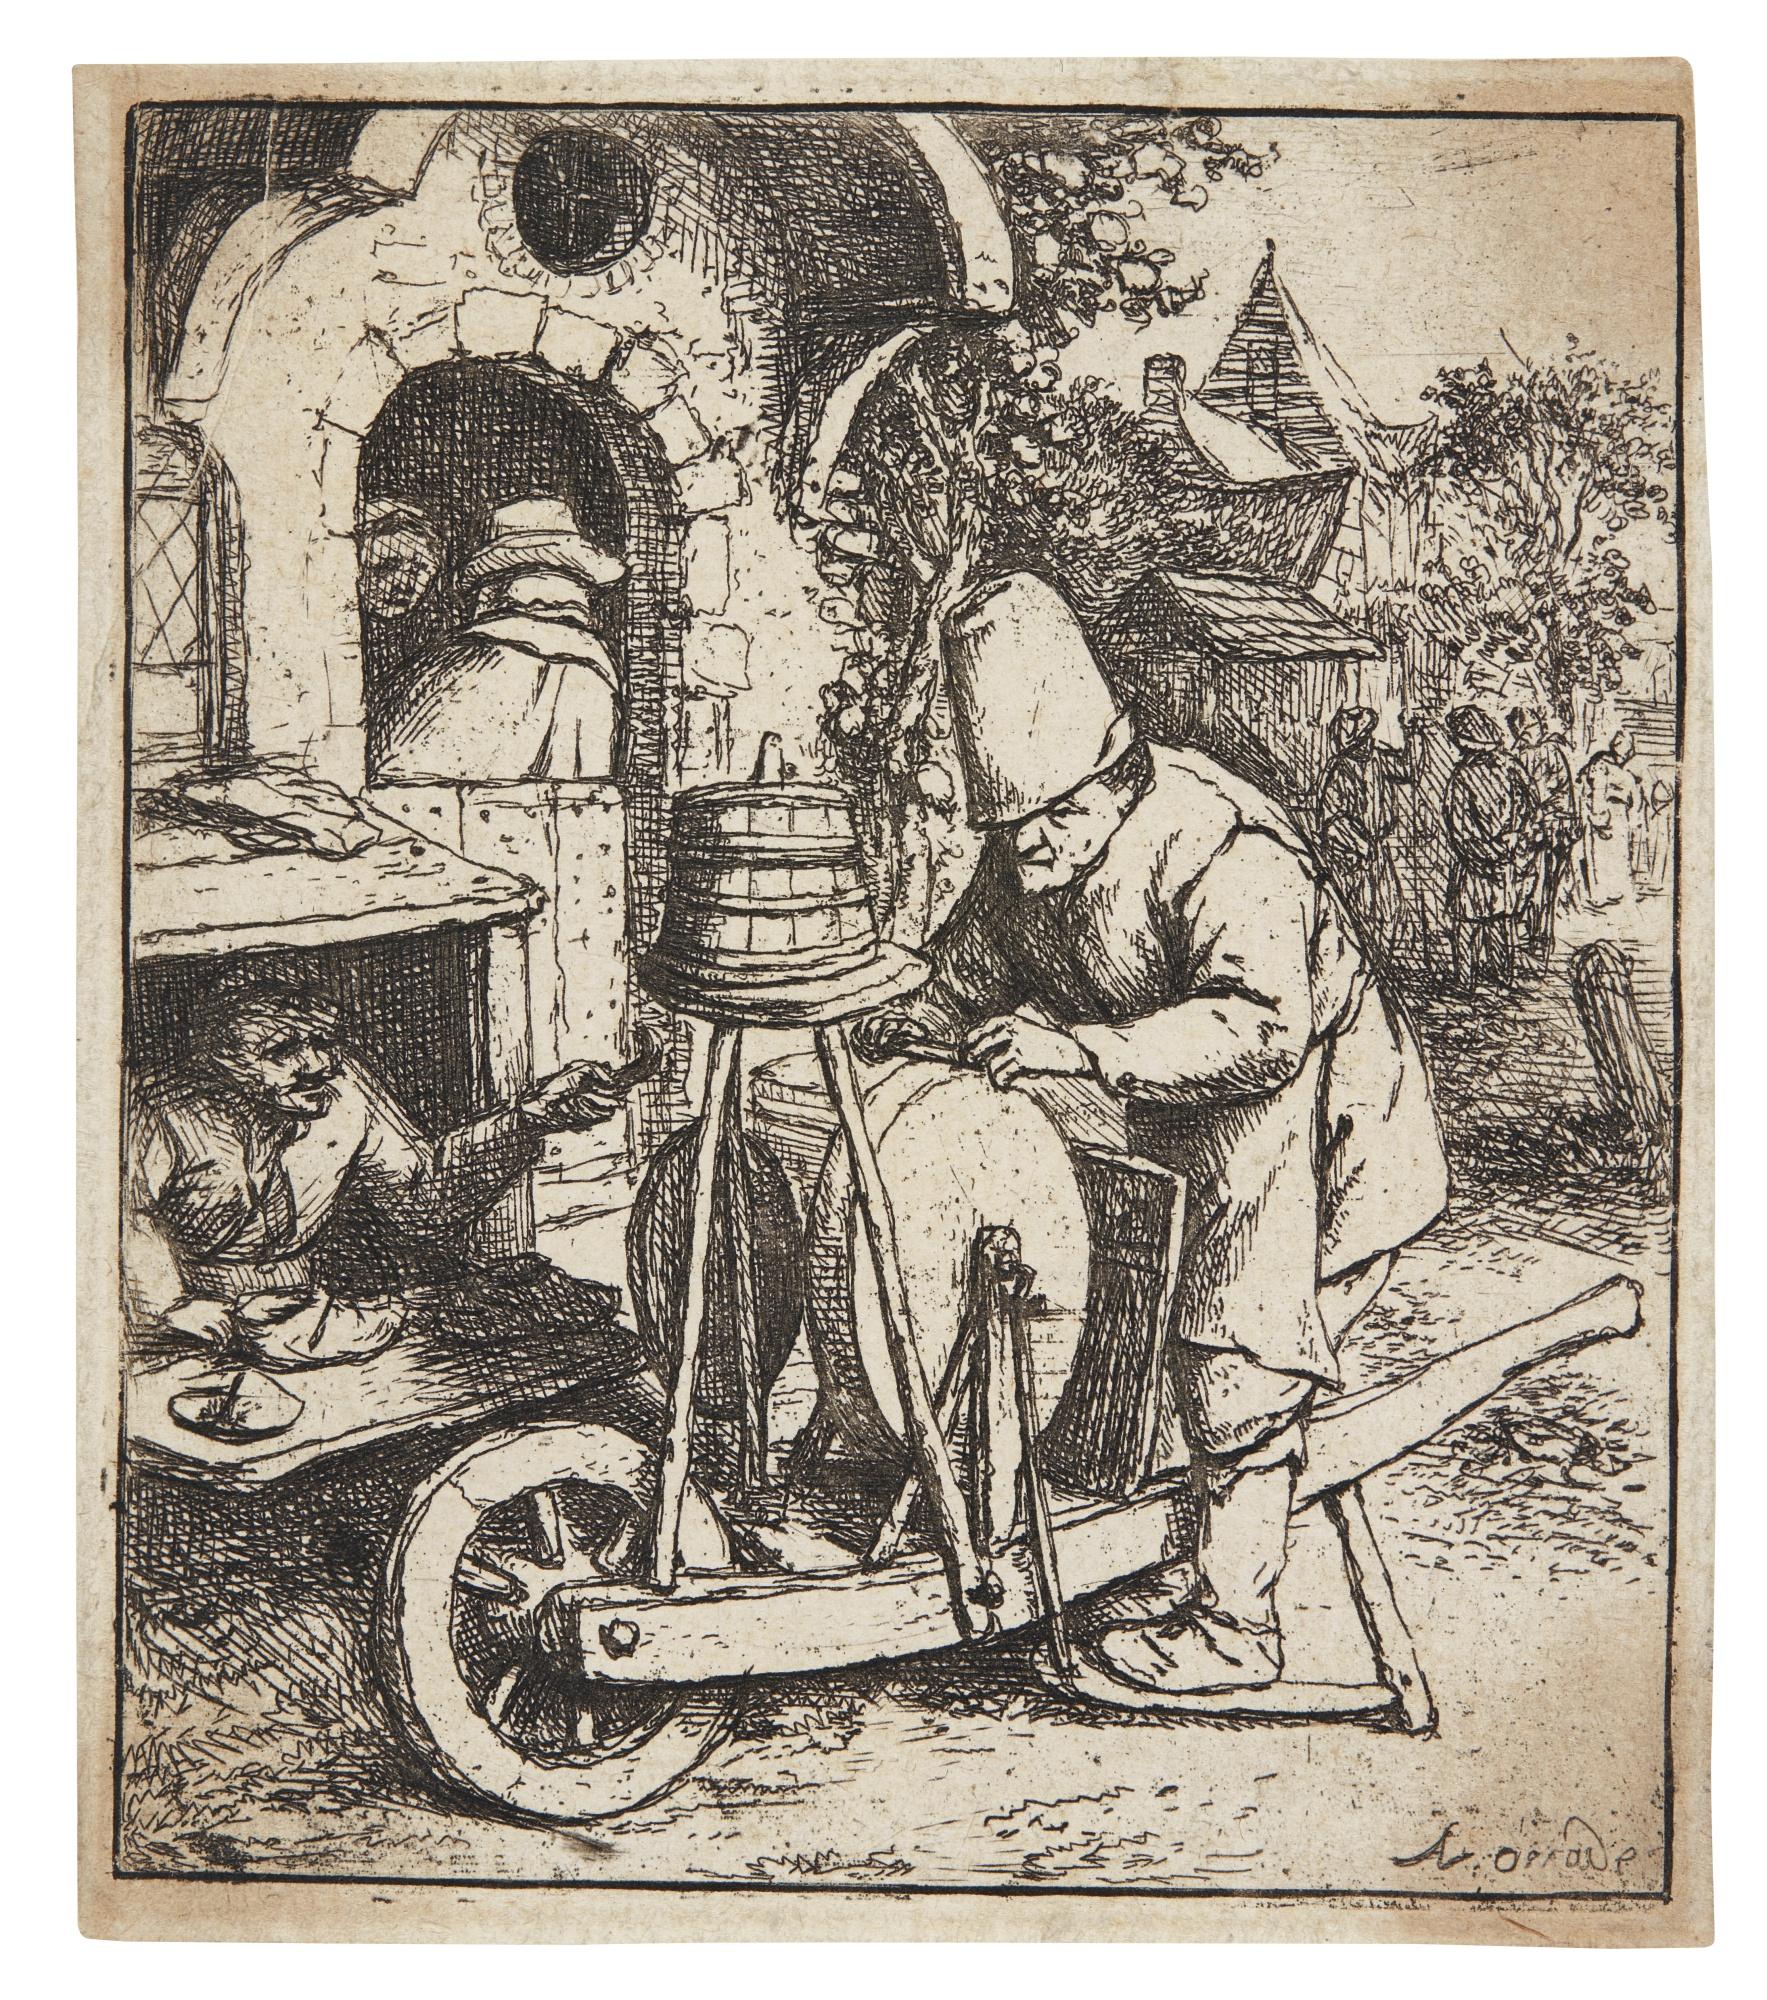 Adriaen van Ostade-The Smoker; The Barn; The Woman Spinning;The Knife Grinder (Hollstein Godefroy 5 2331 36)-1682